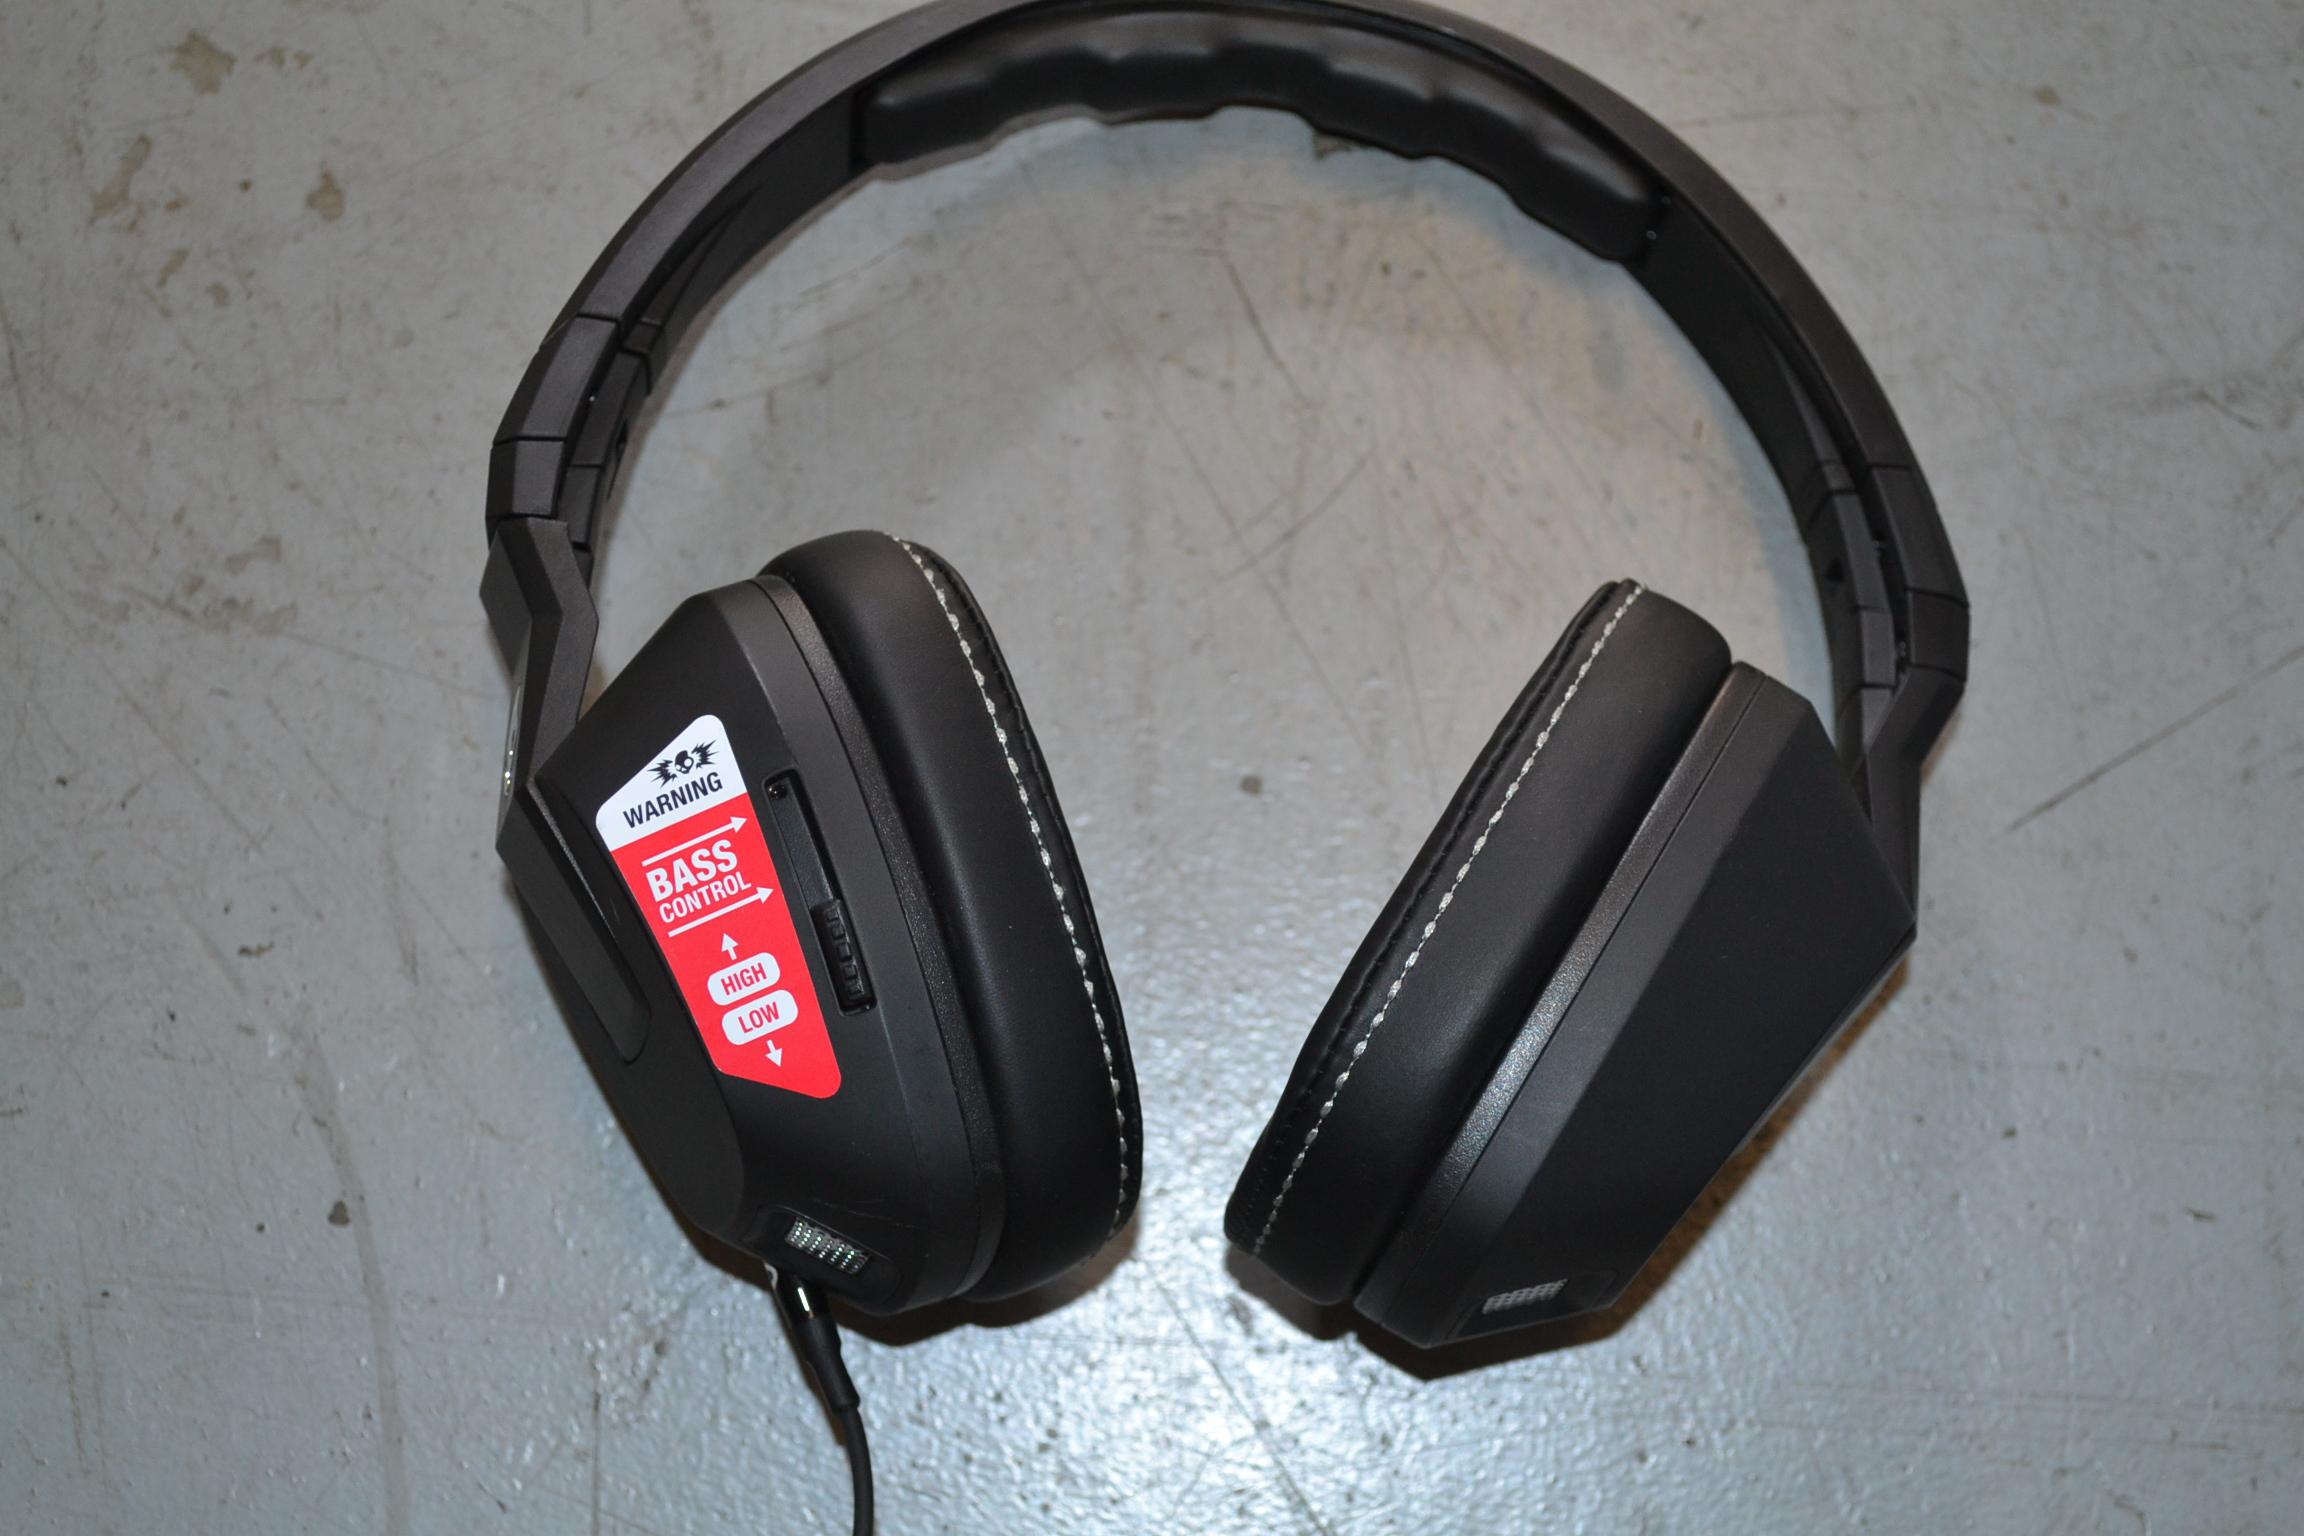 skullcandy headphones with mic instructions